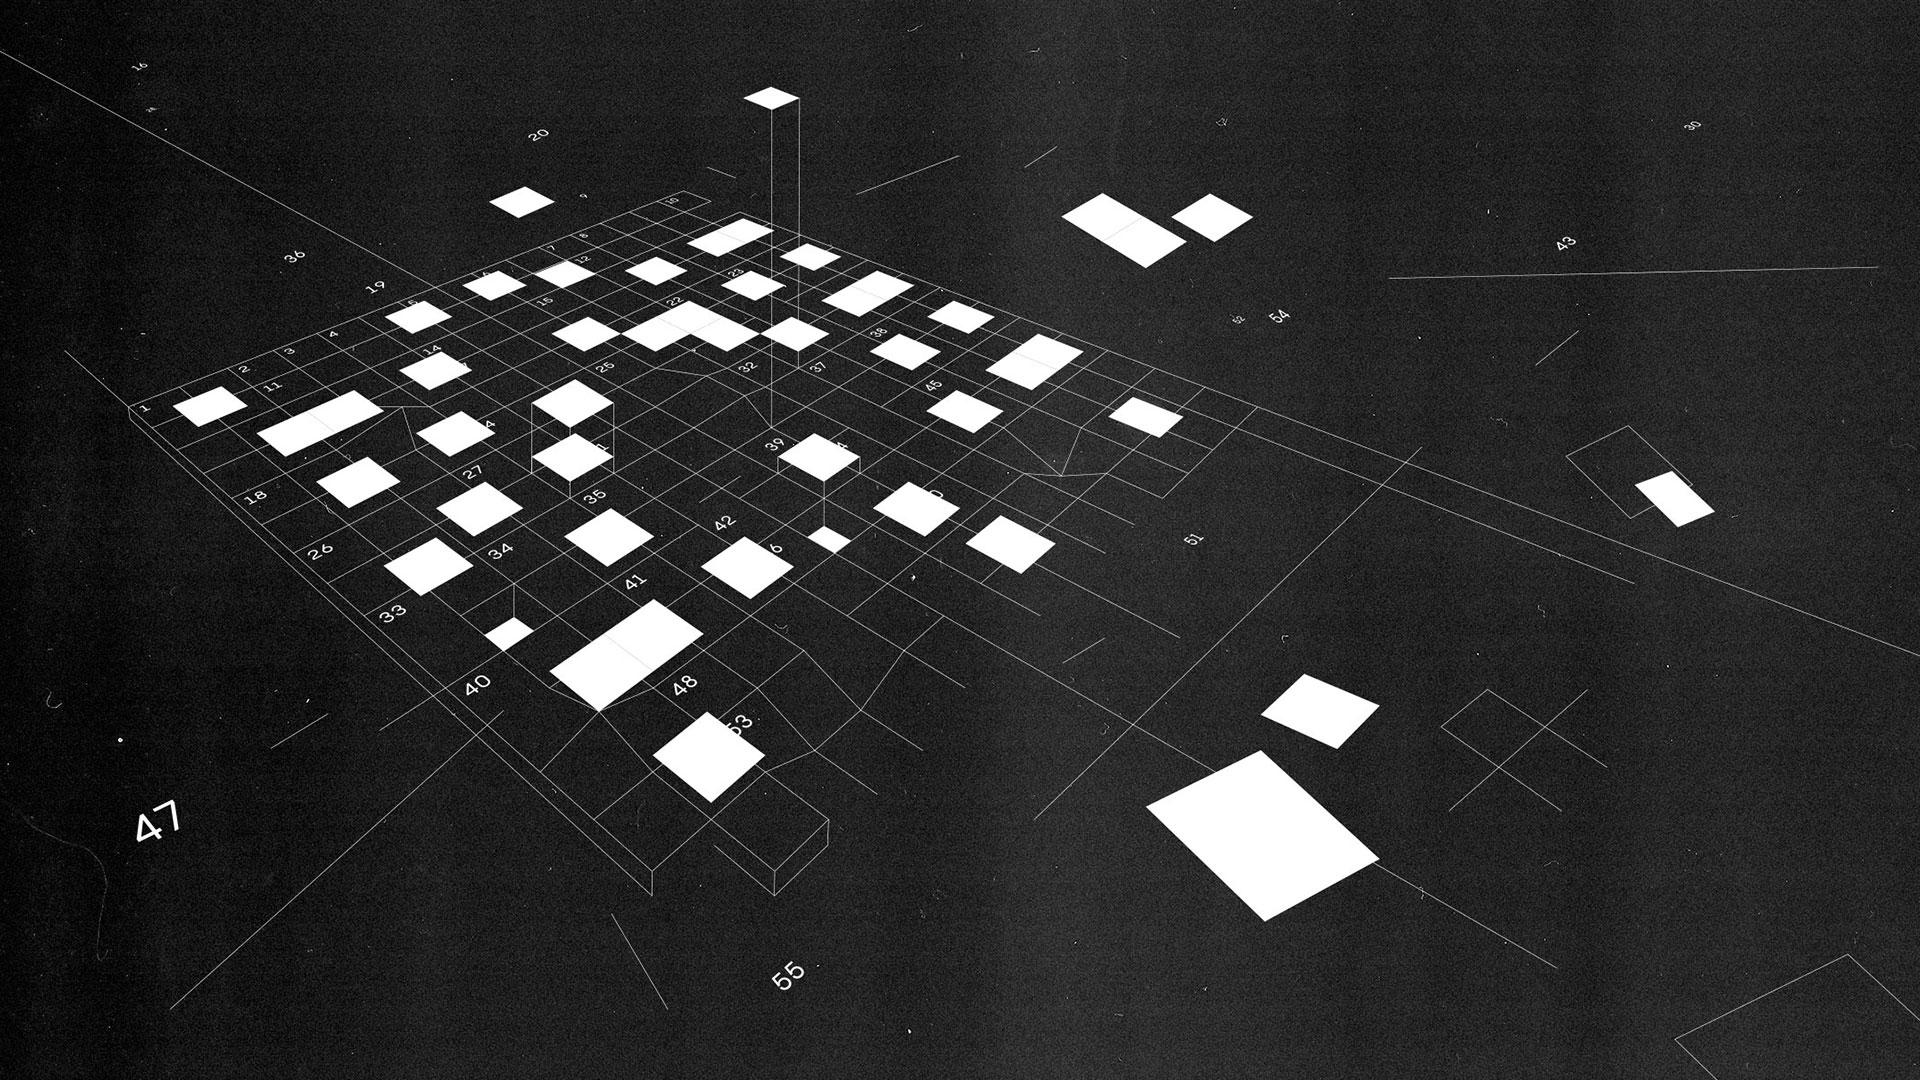 crossword puzzle illustration